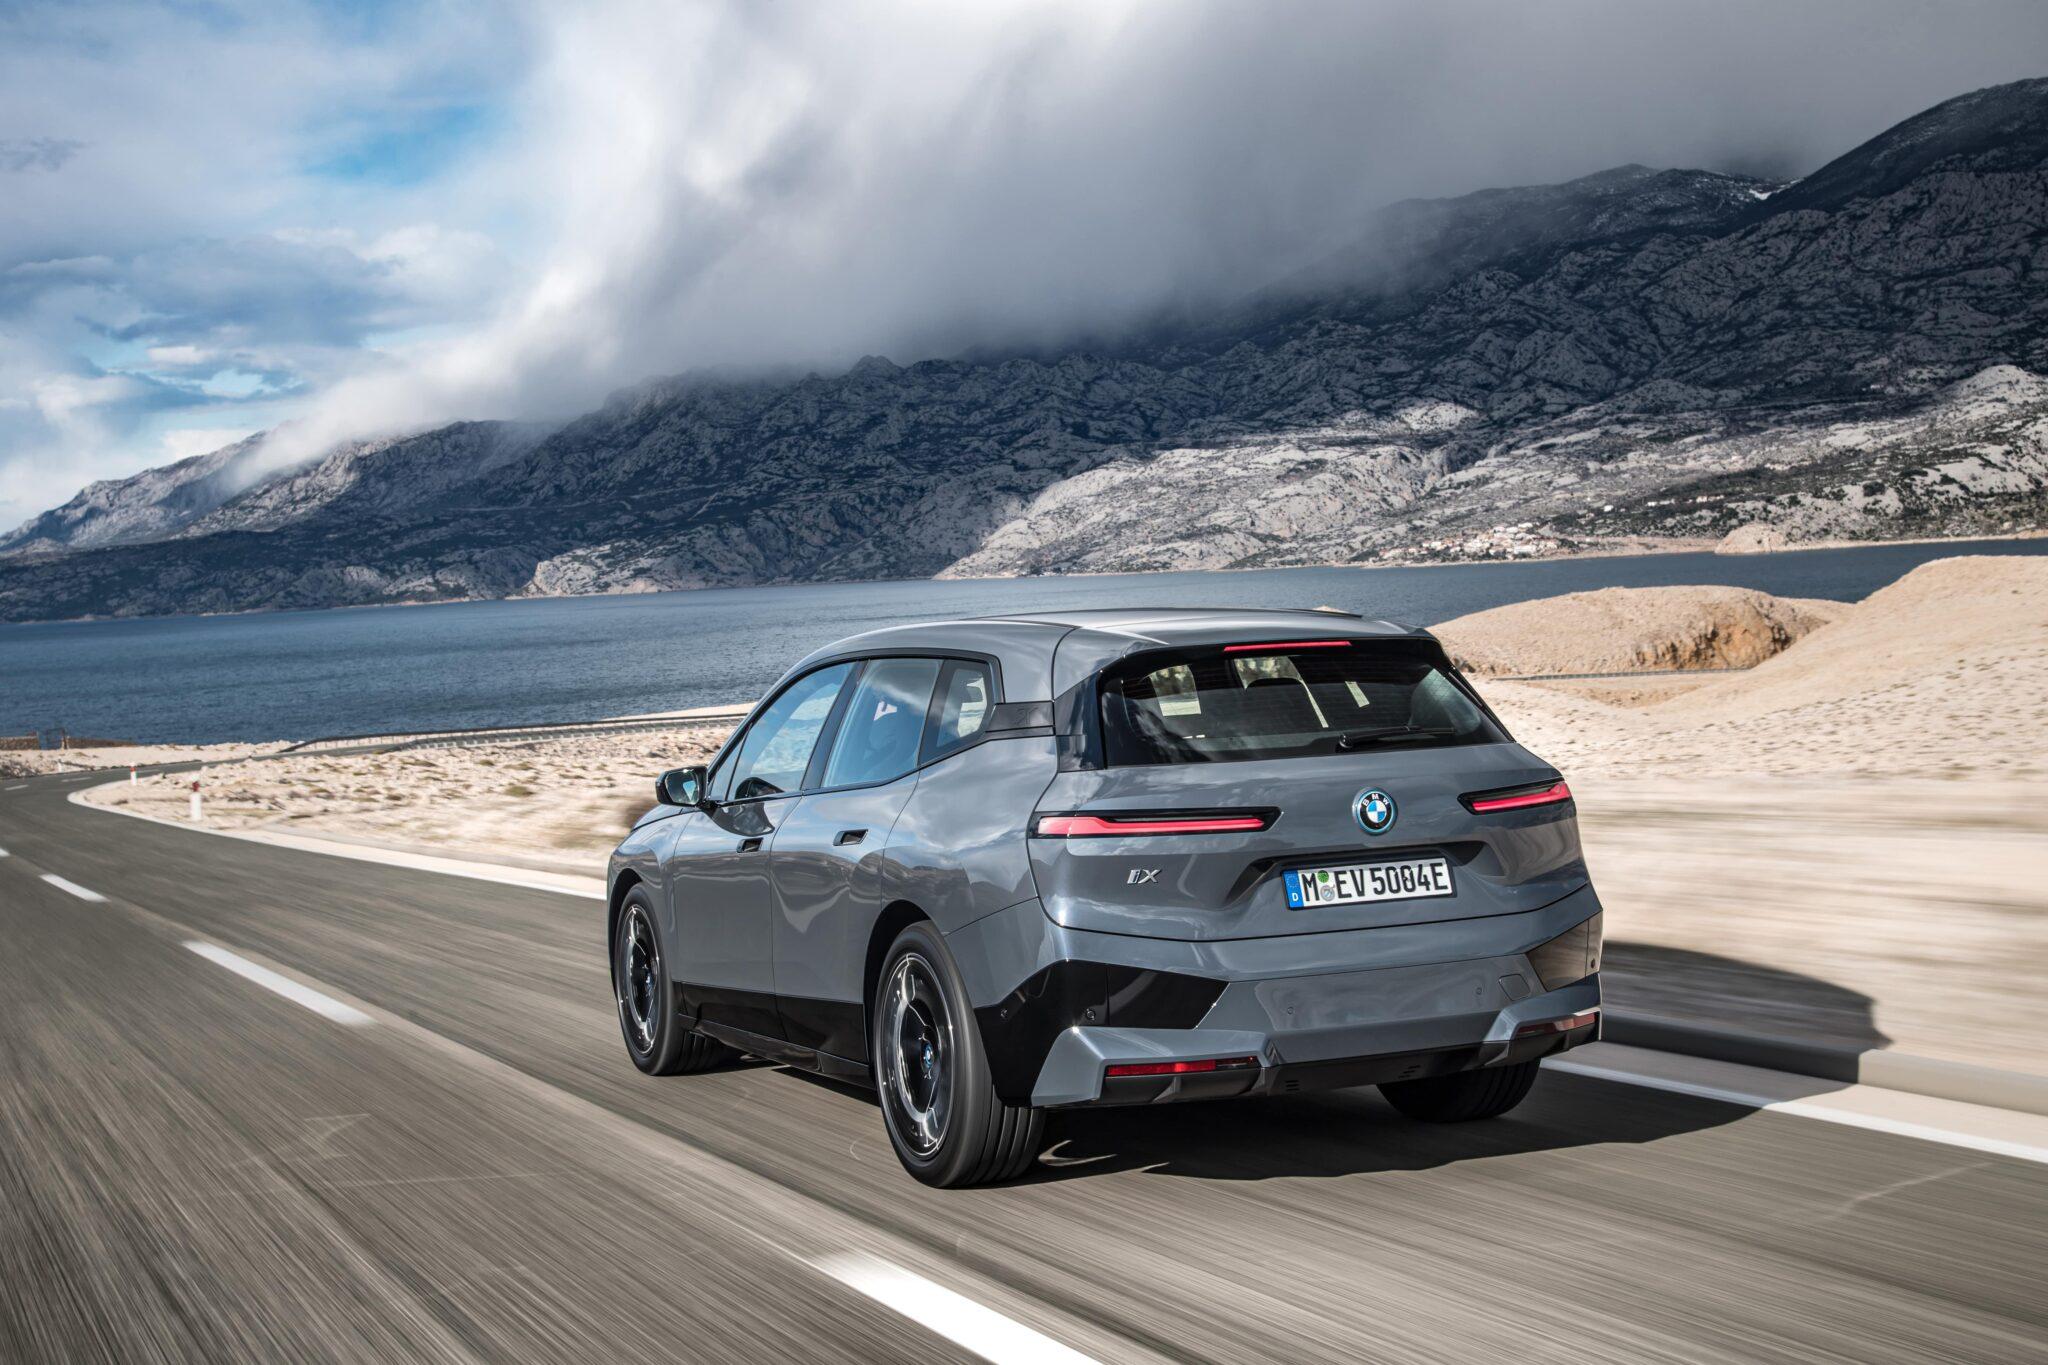 Der erste BMW iX. | P90422130 highRes the bmw ix xdrive50 min scaled